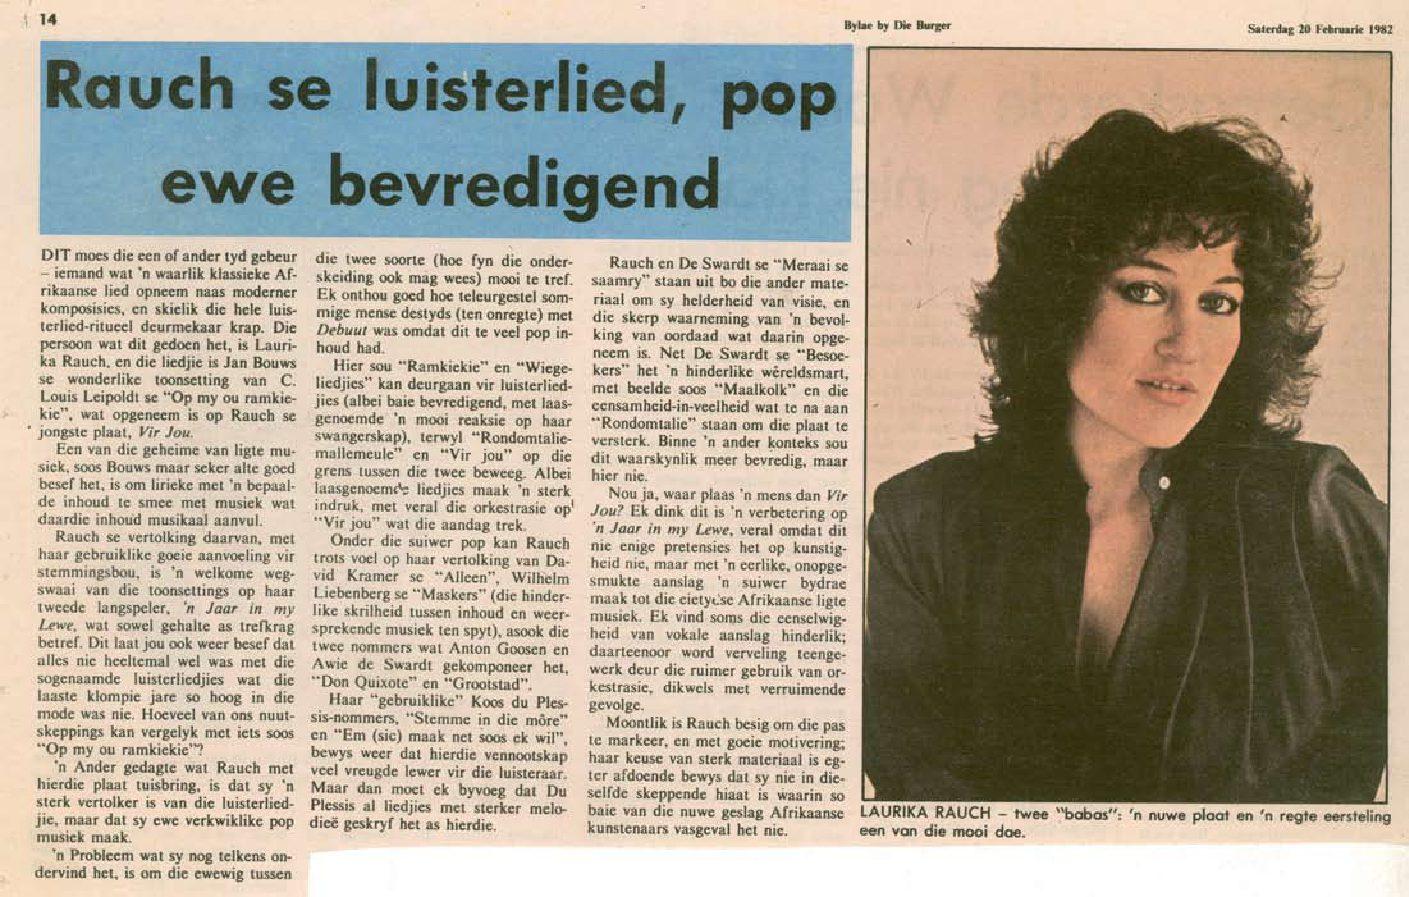 1982-die-burger-rauch-se-luisterlied-pop-ewe-bevredigend